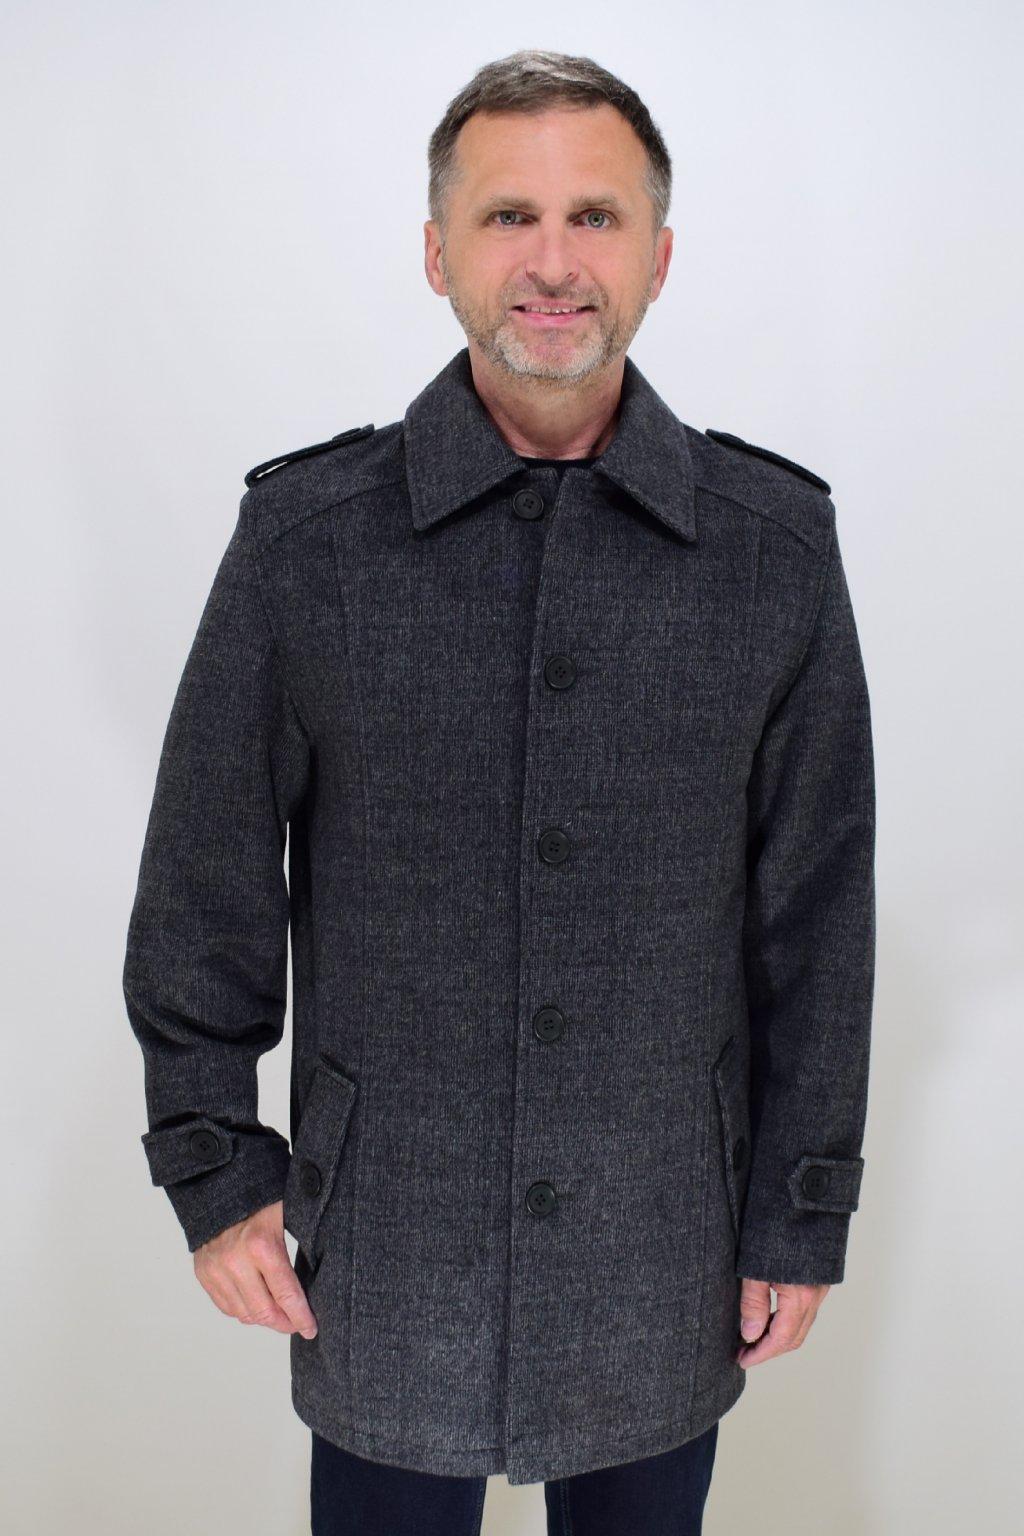 Pánský šedý flaušový kabát Šimon nadměrné velikosti.